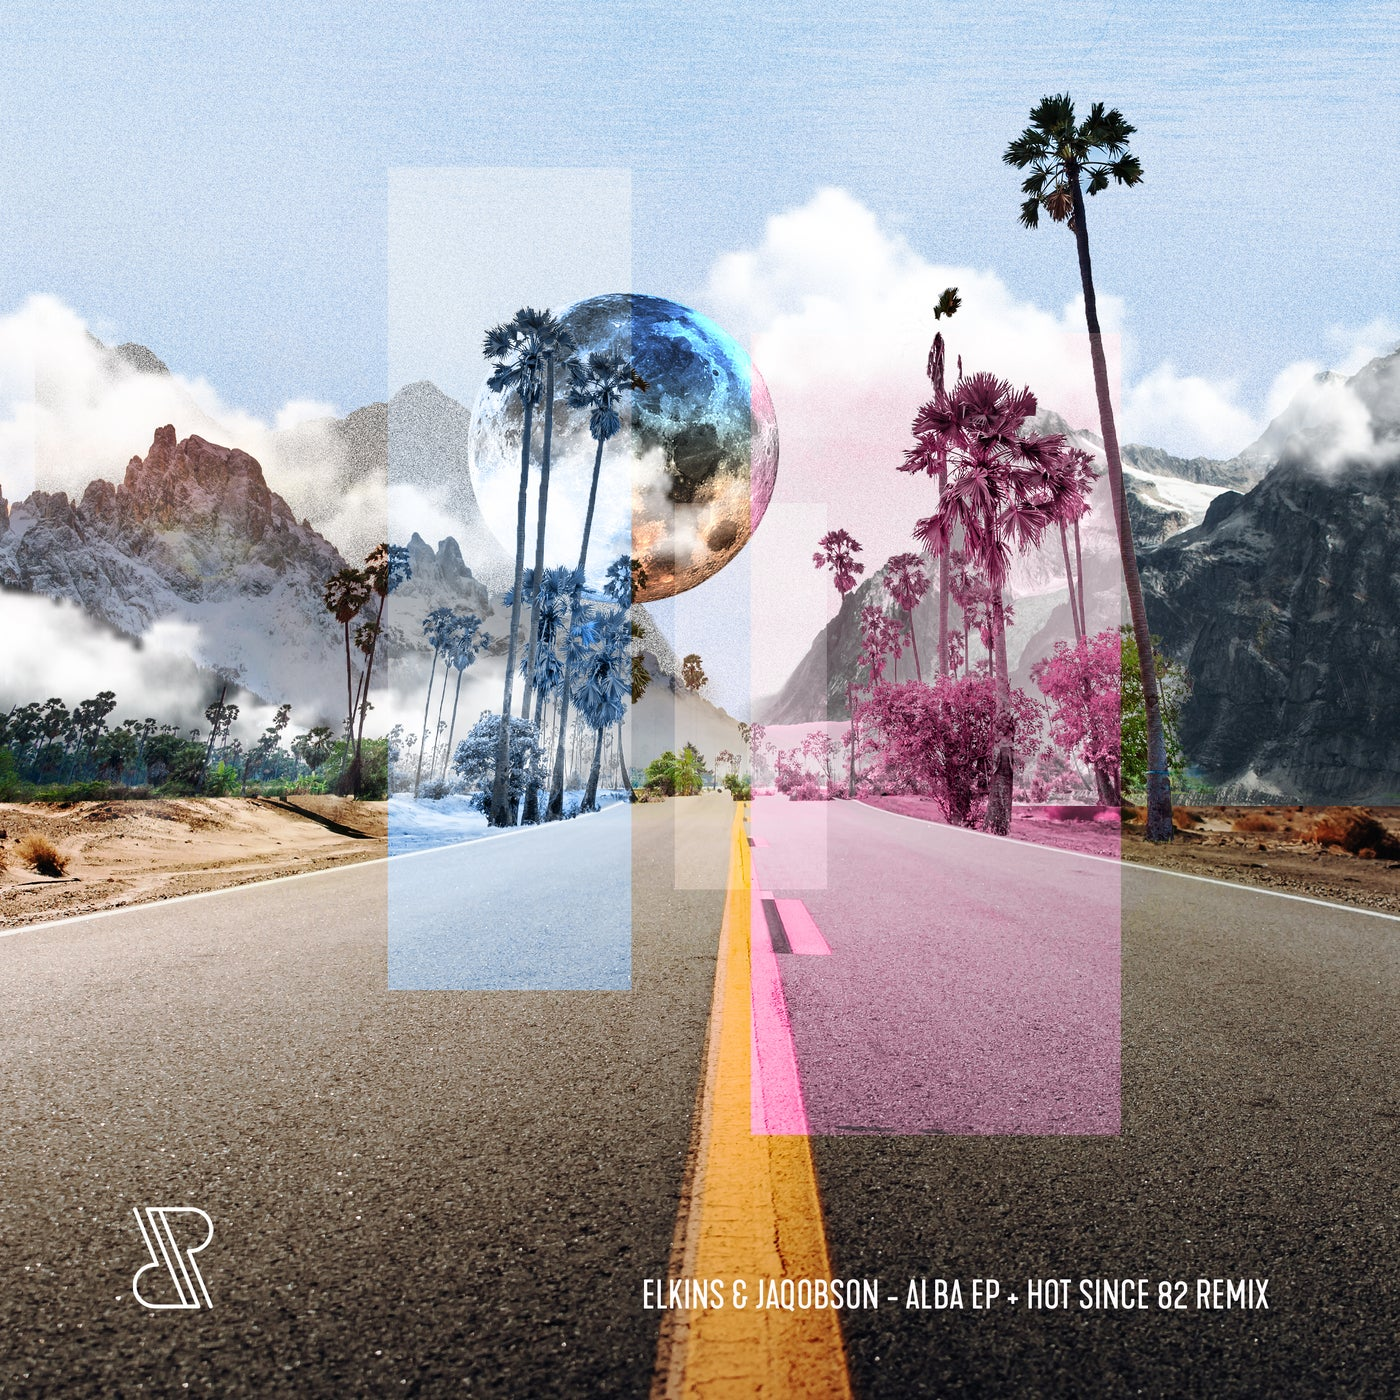 Alba (Hot Since 82 Remix)